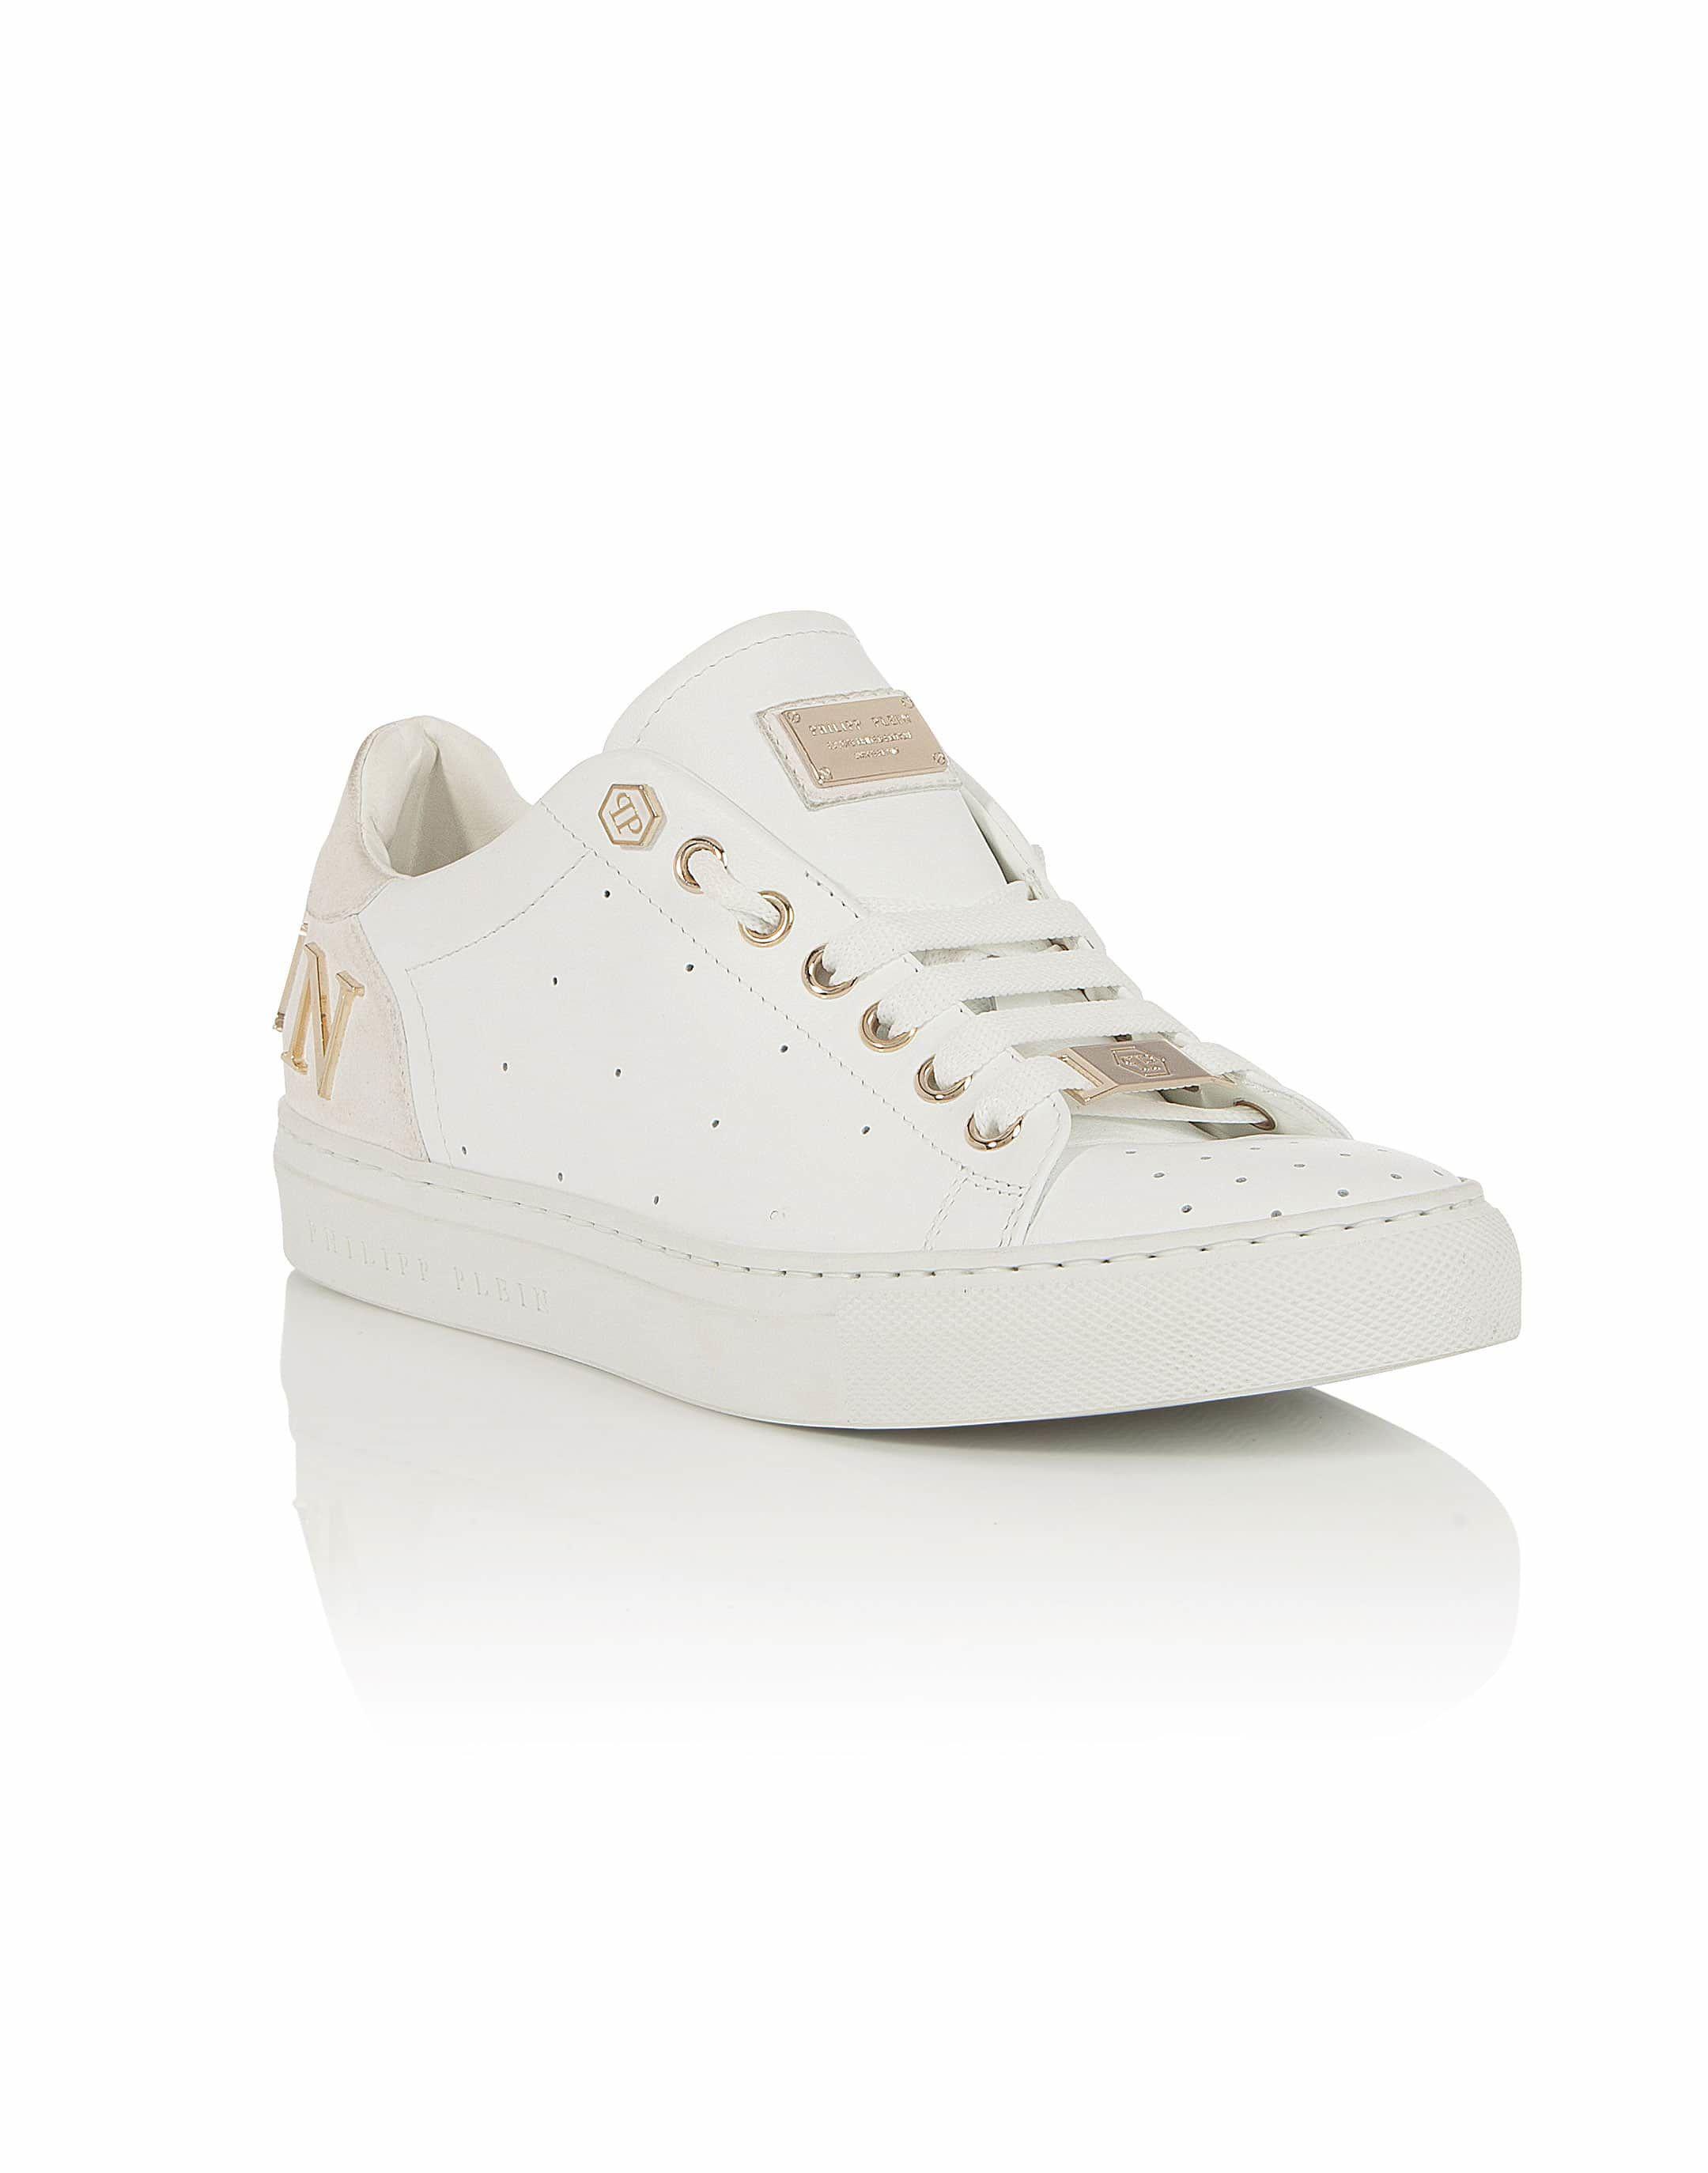 You Got A Chance sneakers - White Philipp Plein fBlaHCt